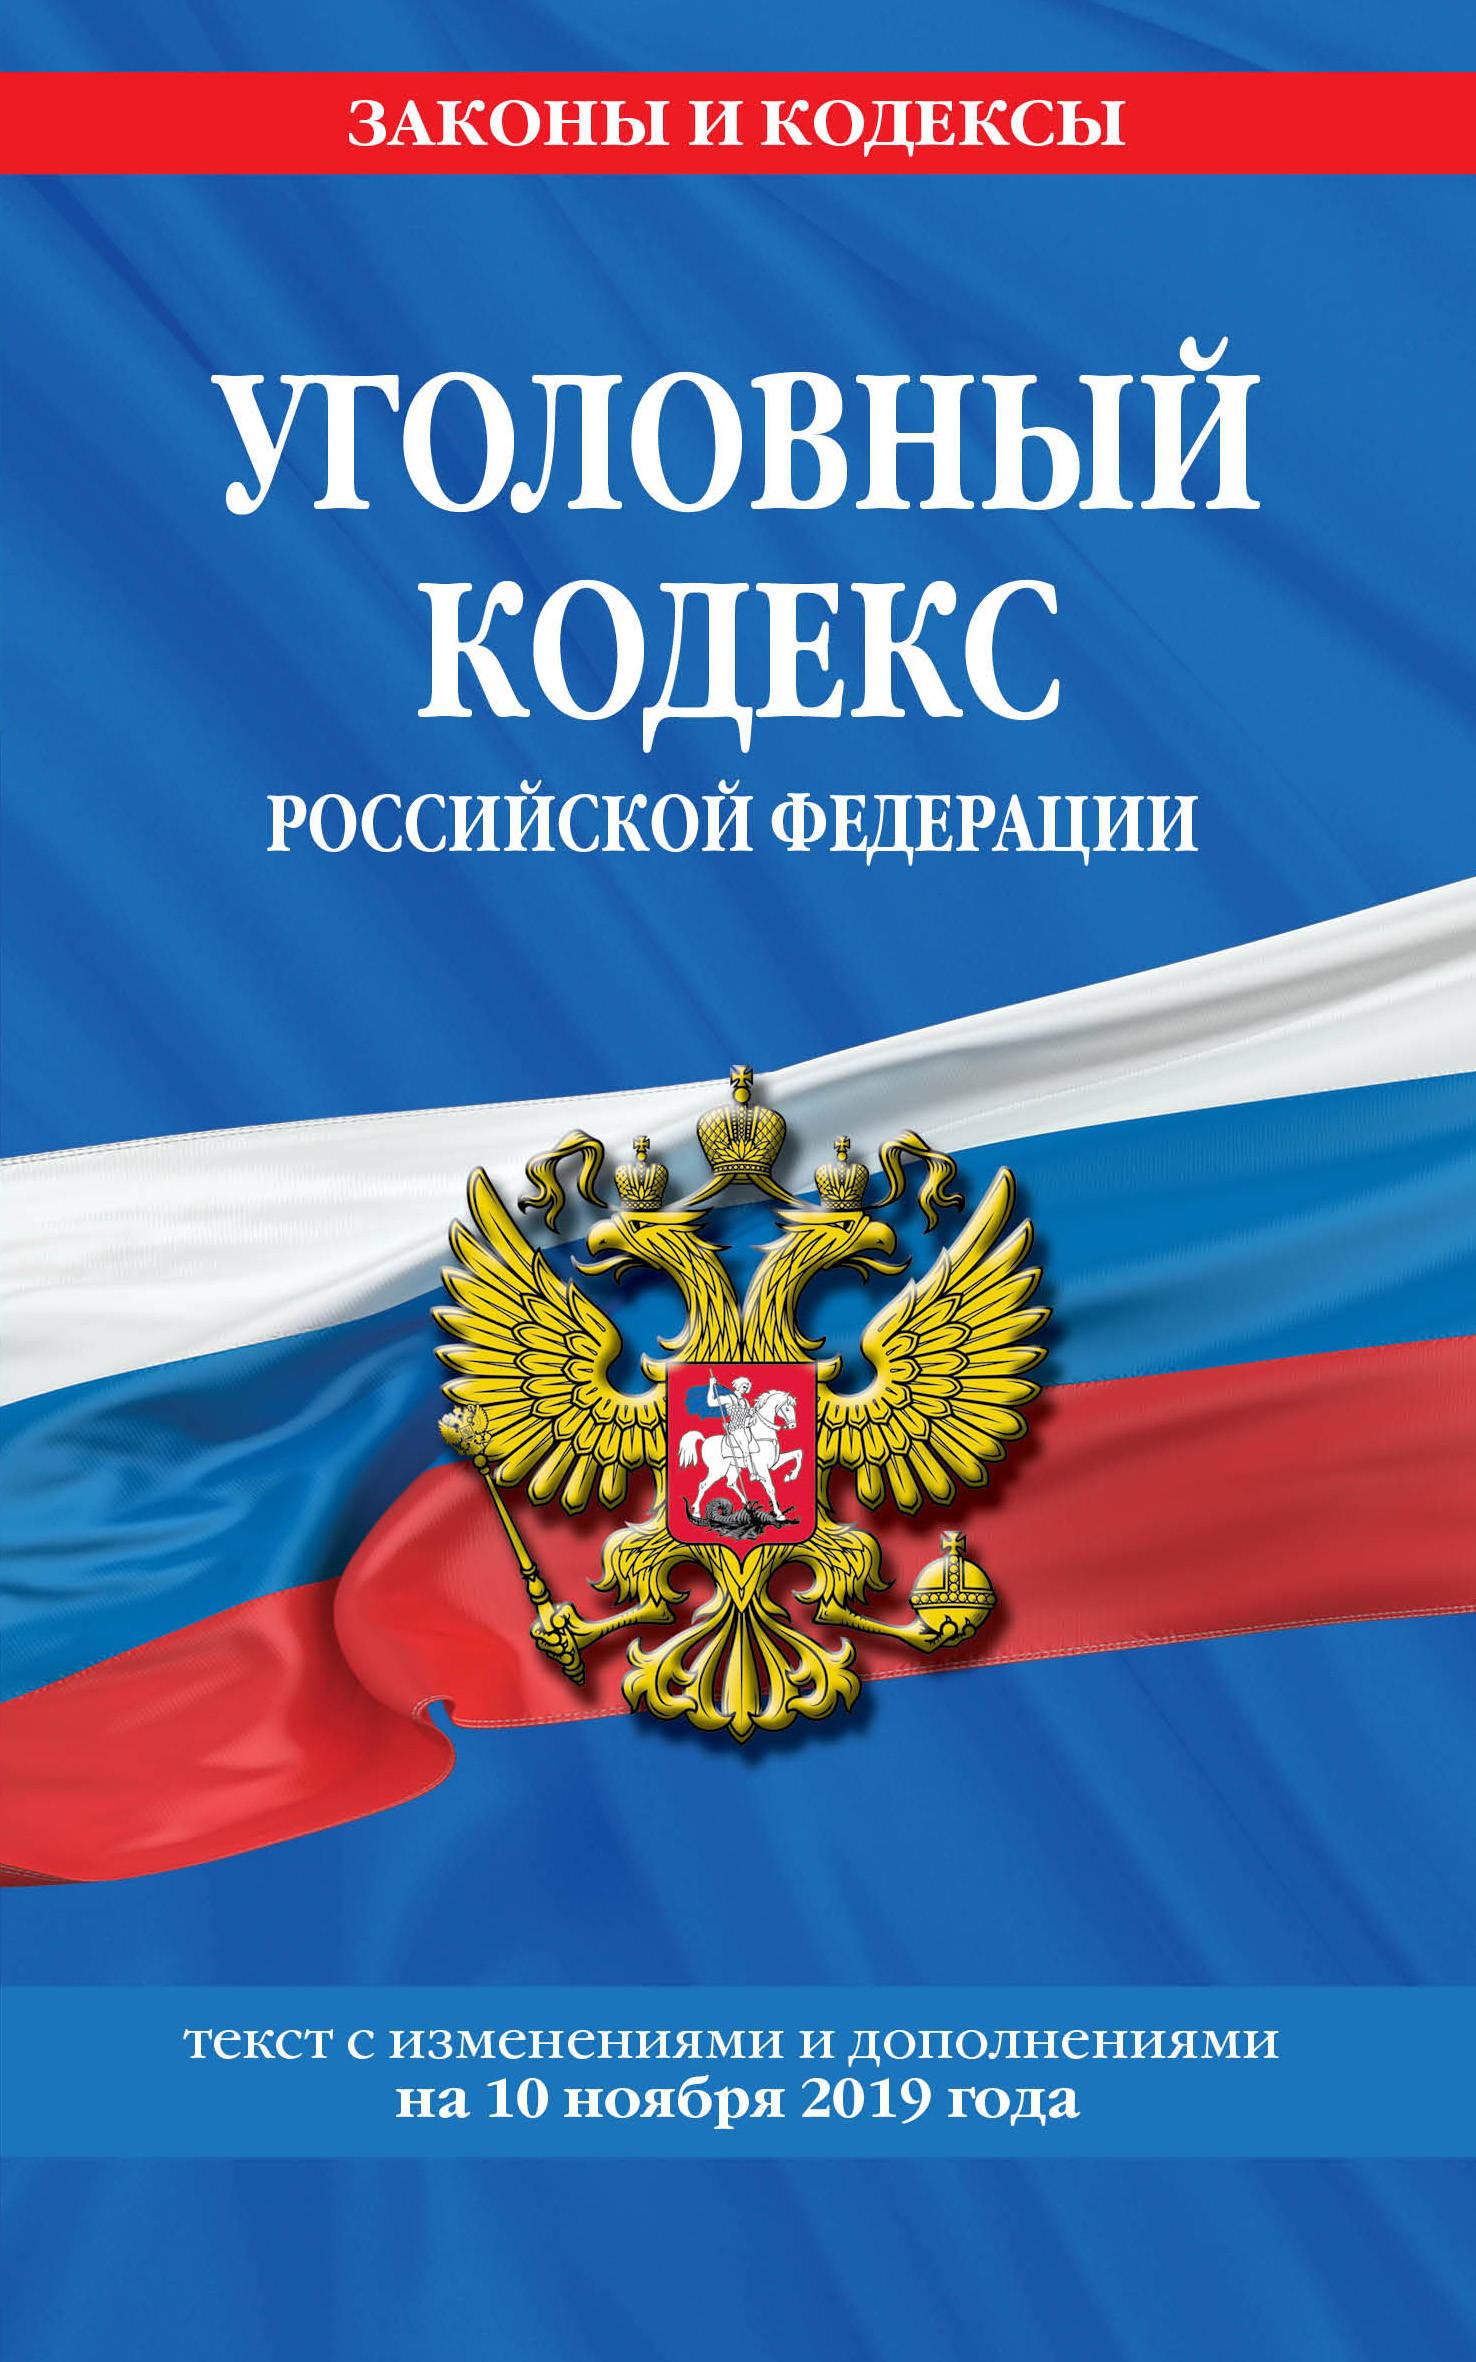 Ugolovnyj kodeks Rossijskoj Federatsii: tekst s izm. i dop. na 10 nojabrja 2019 goda